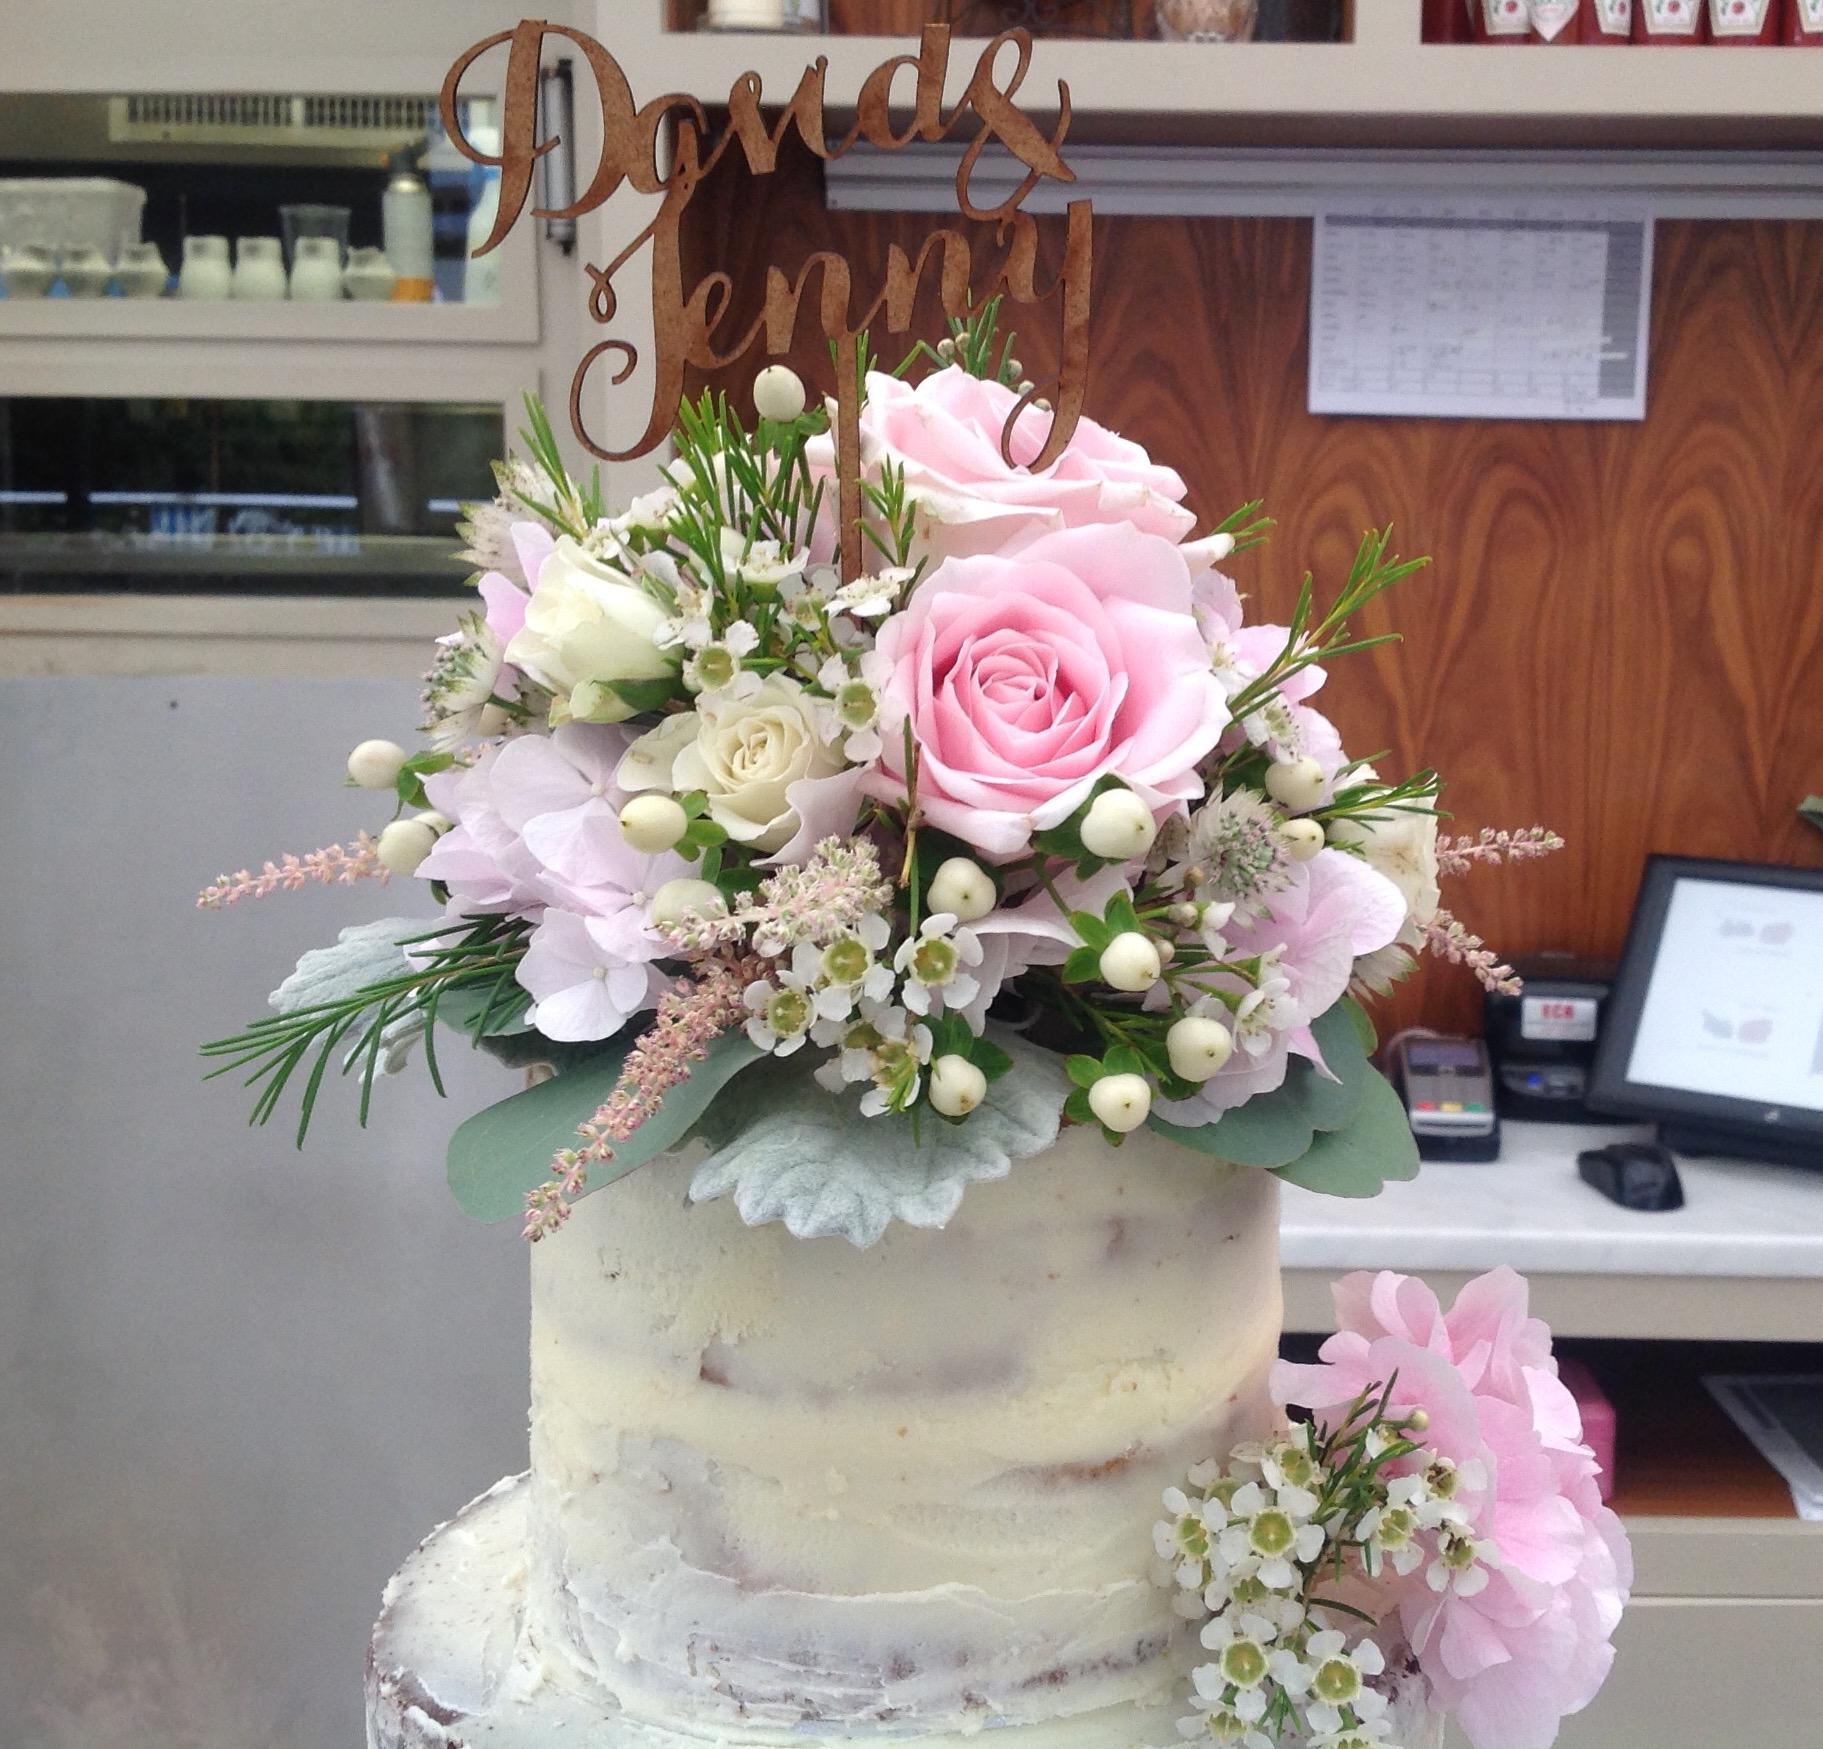 lilac_thyme-wedding_cake.jpeg